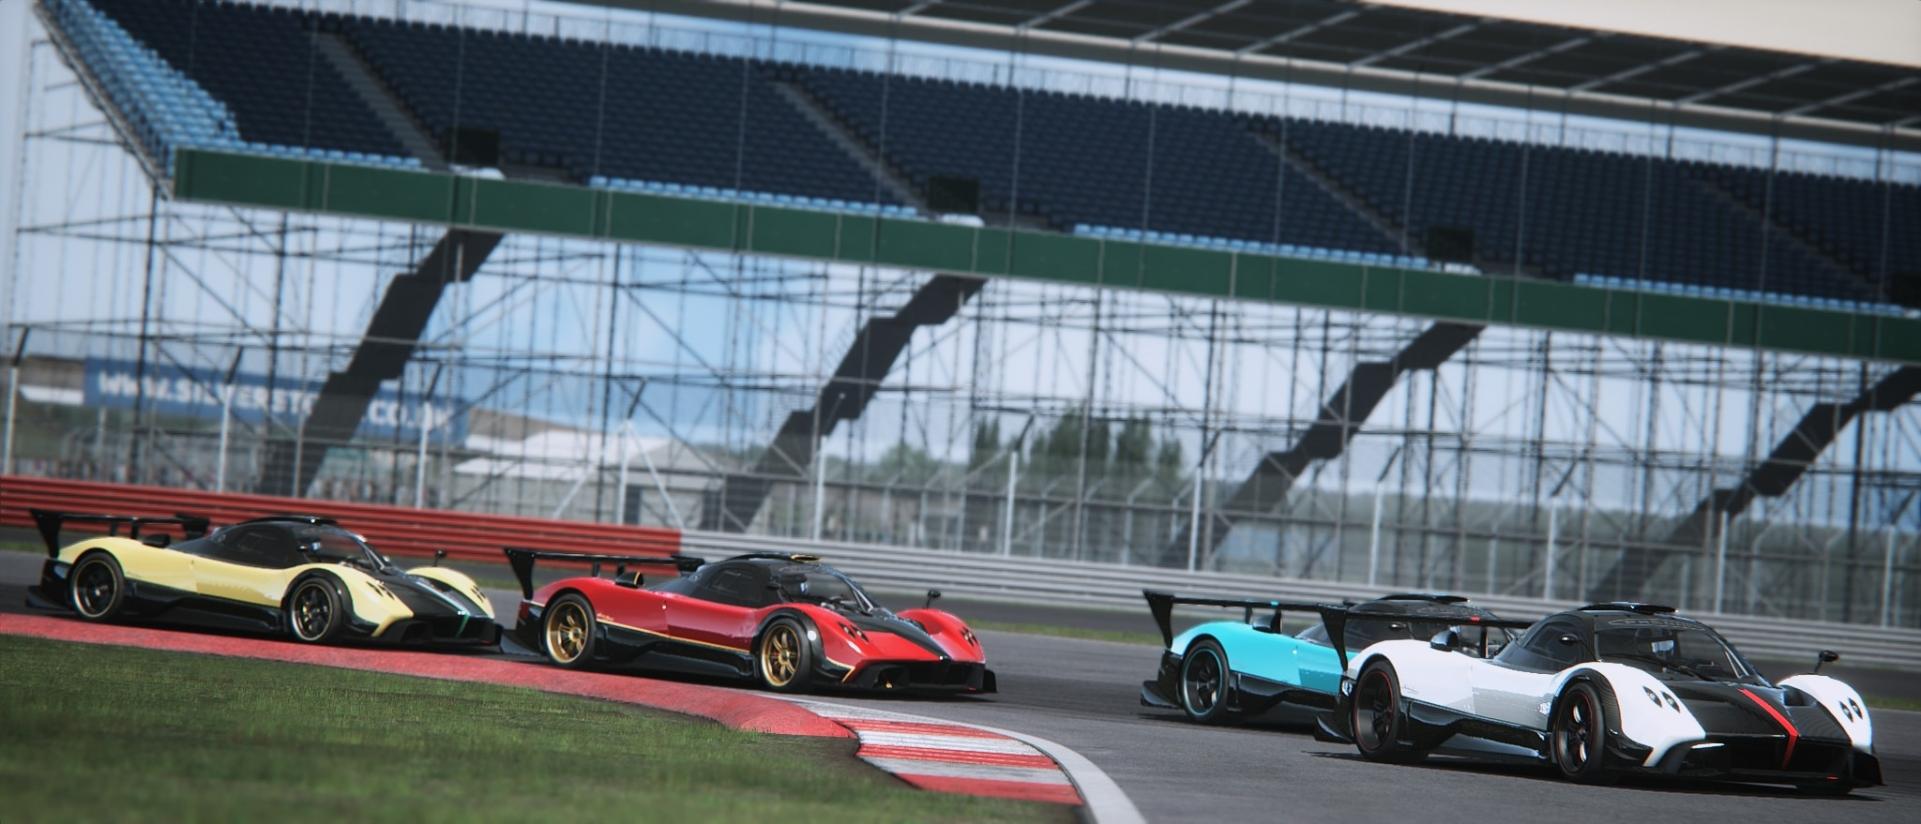 Assetto Corsa - Pagani Zonda Silverstone 05